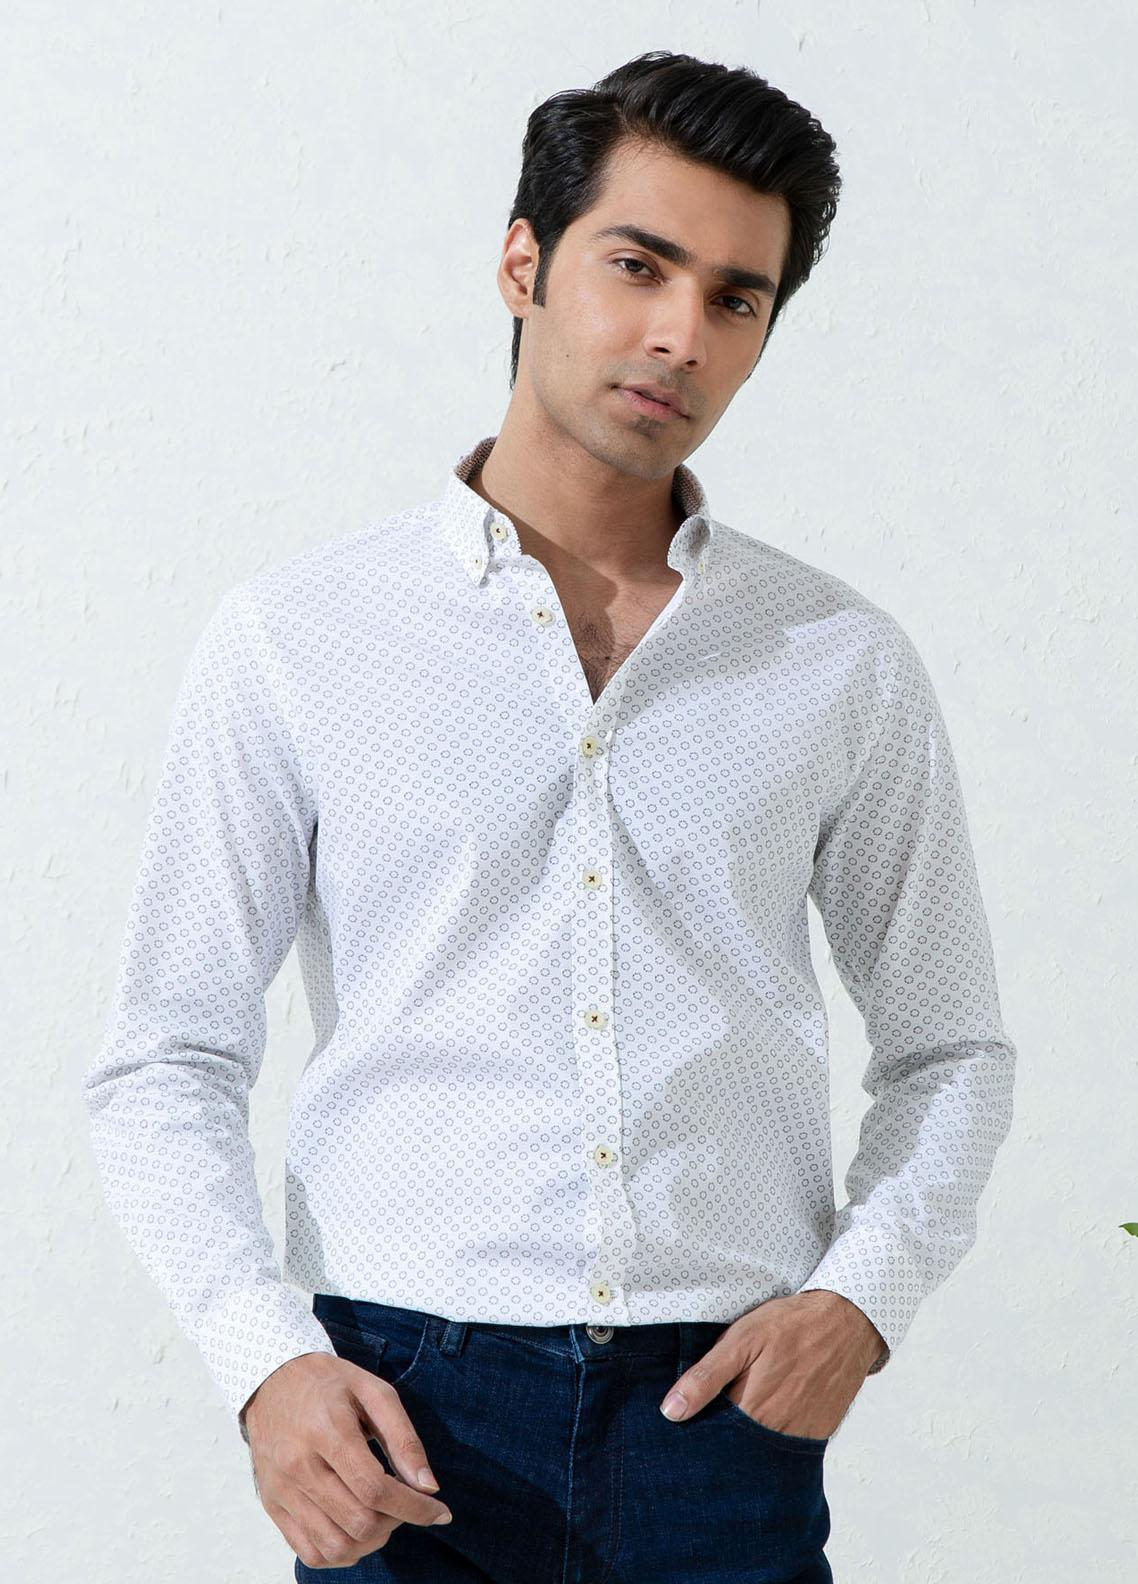 Brumano Cotton Casual Men Shirts -  White Printed Shirt With Inner Collar Detailing